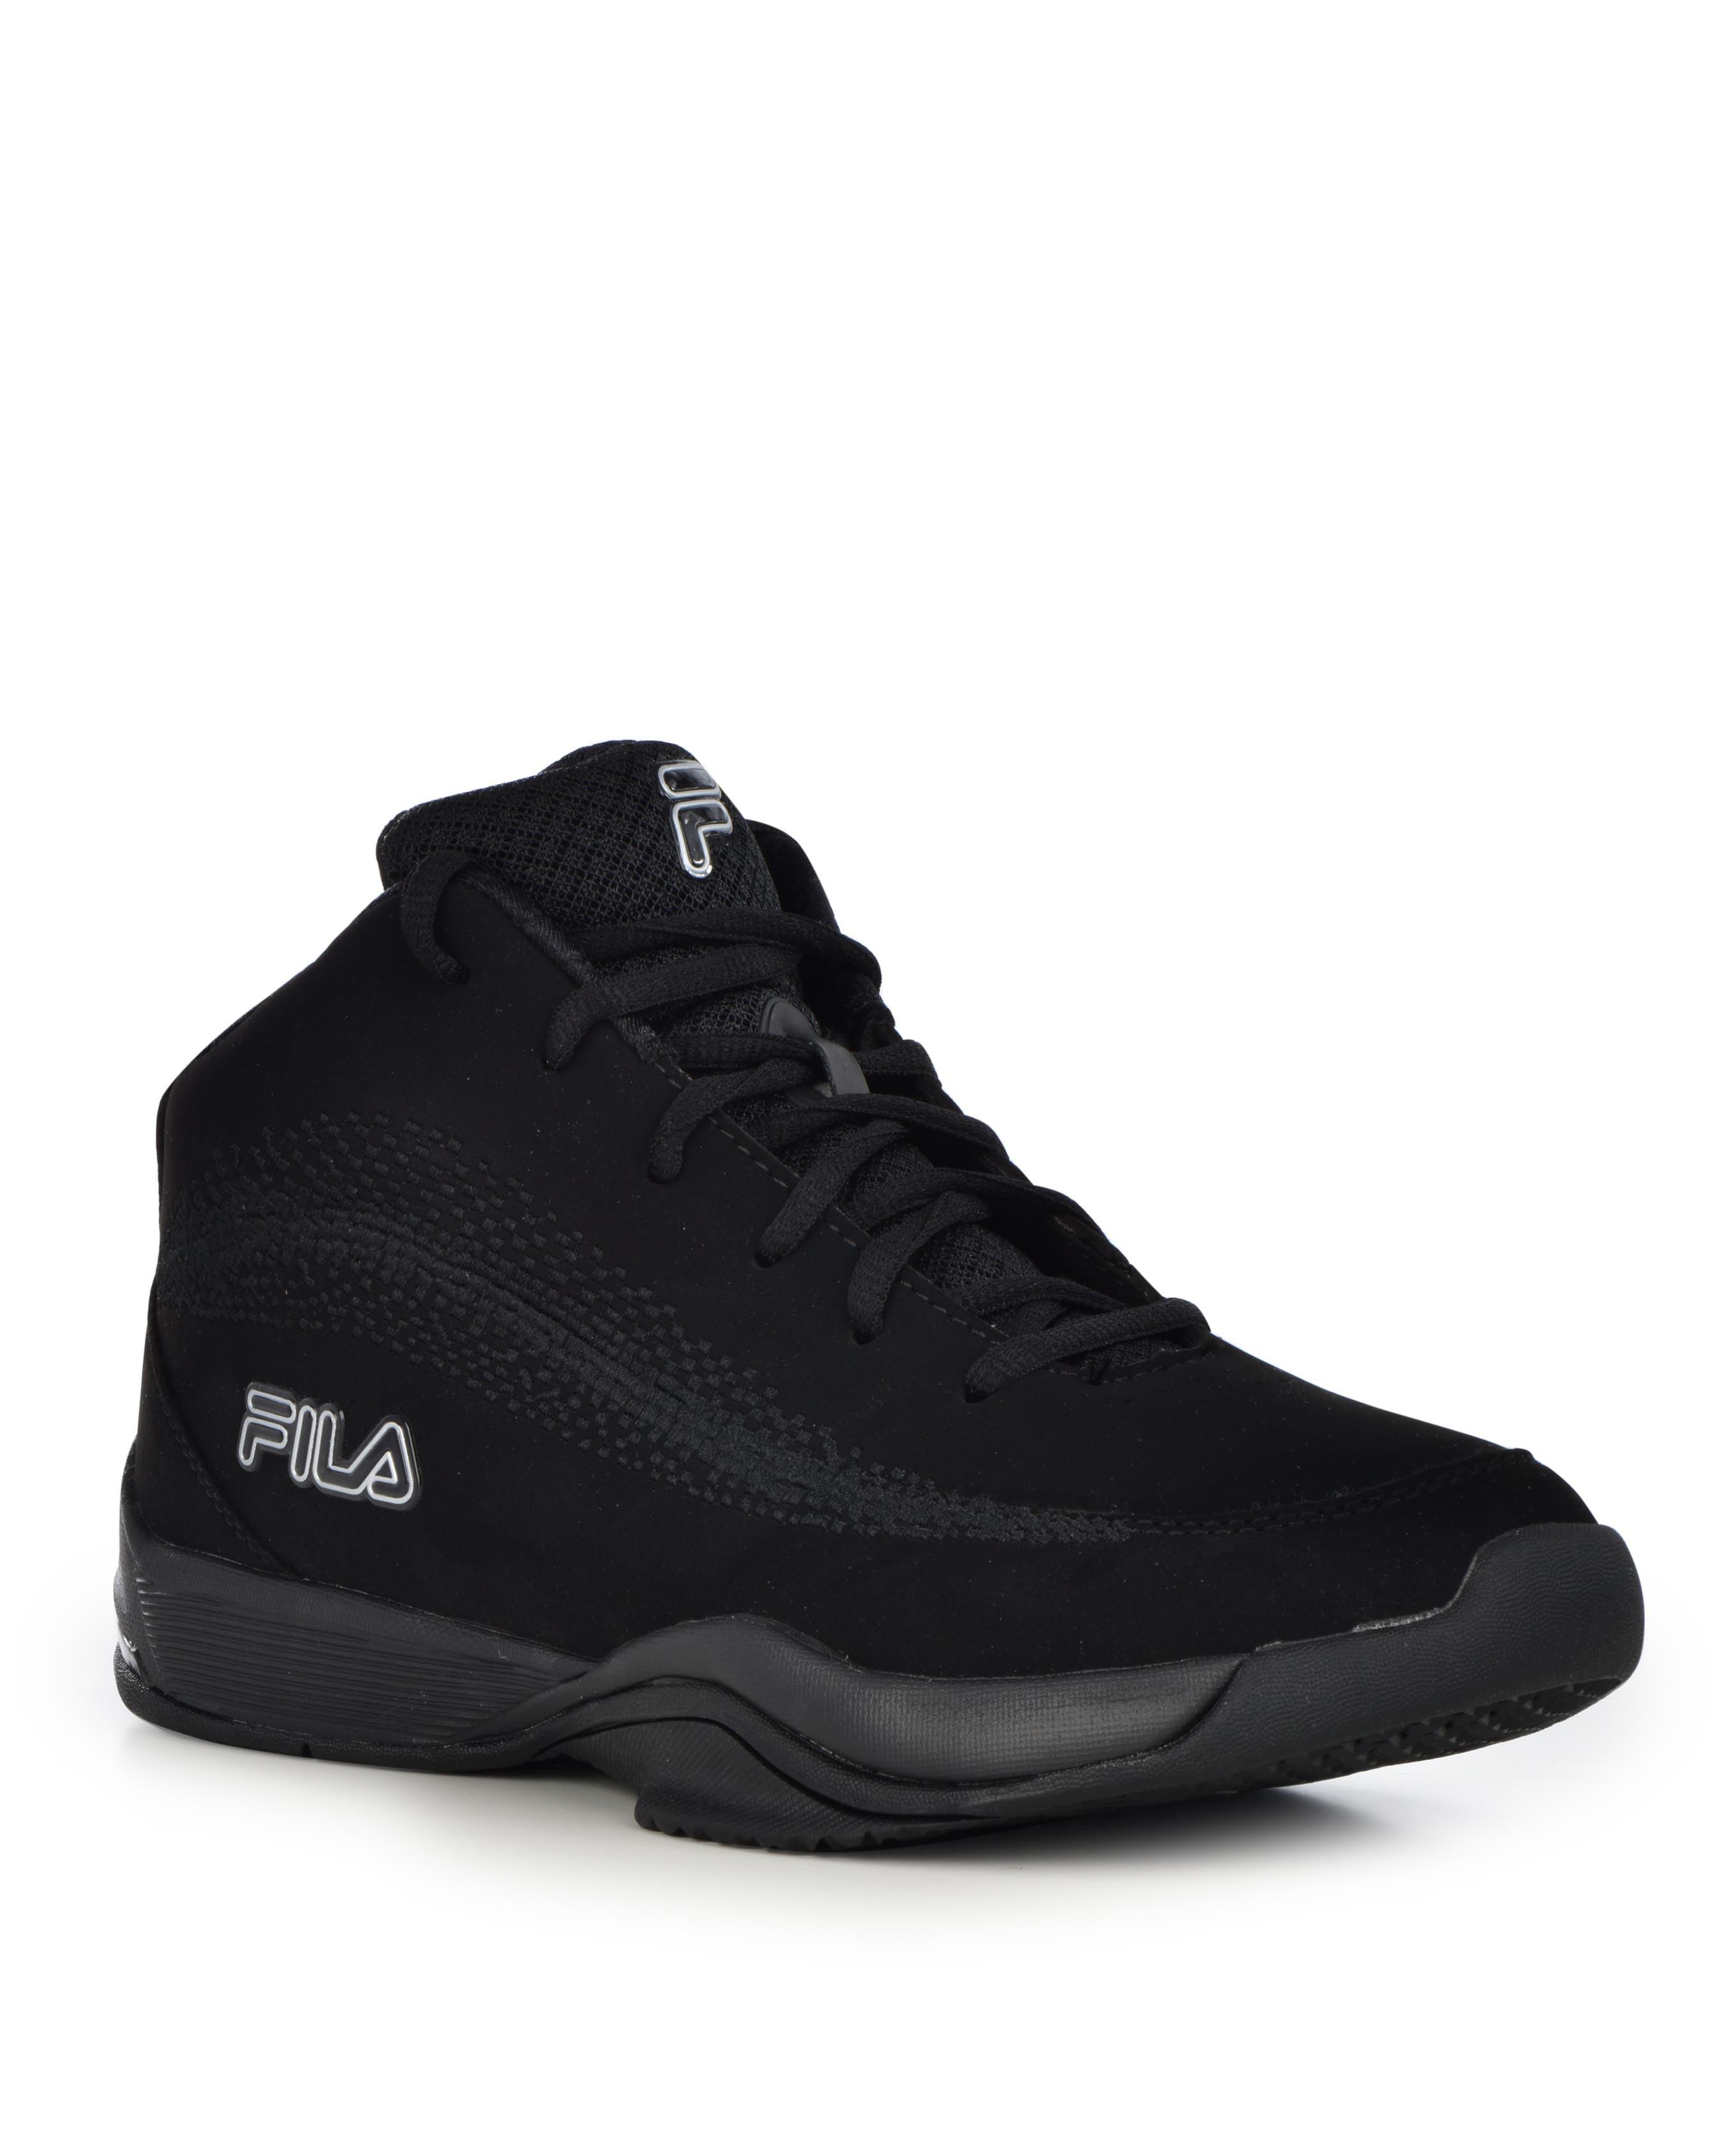 Fila Men's Contingent 4 Basketball Sneaker by